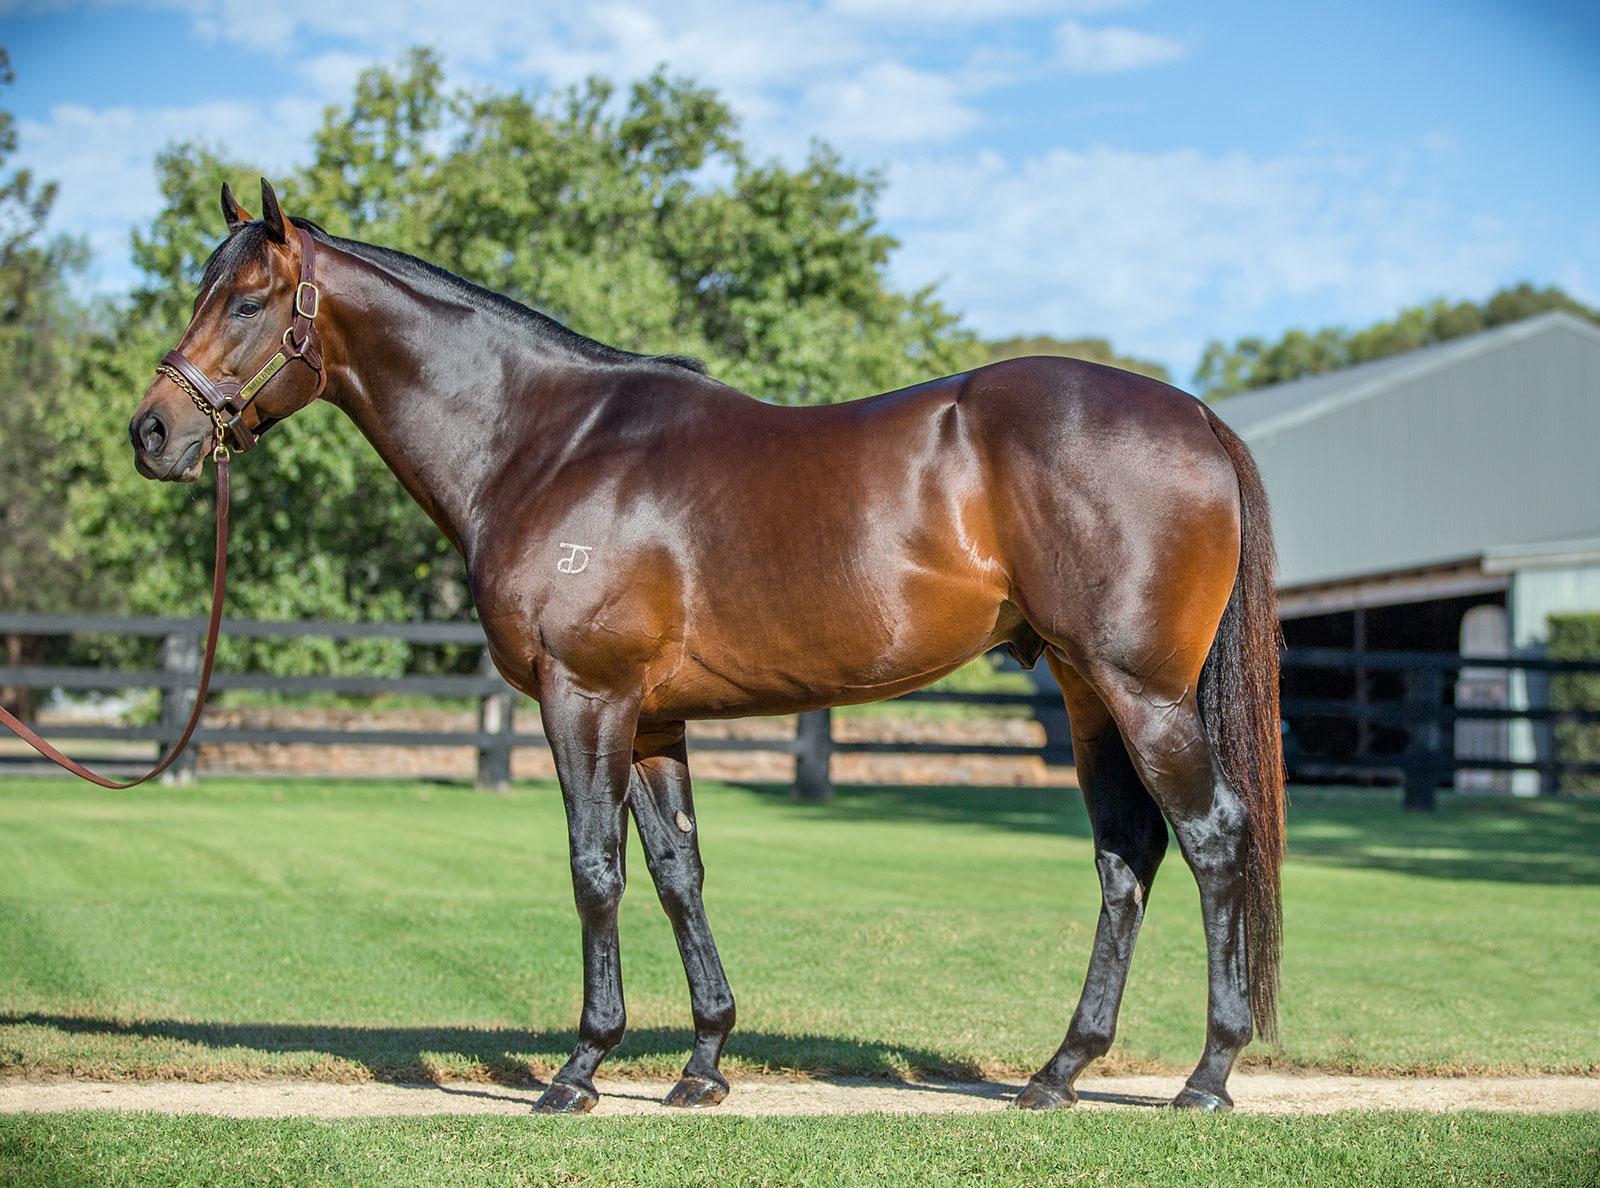 https://www.stallions.com.au/wp-content/uploads/2019/10/hellbent_3e_19.jpg